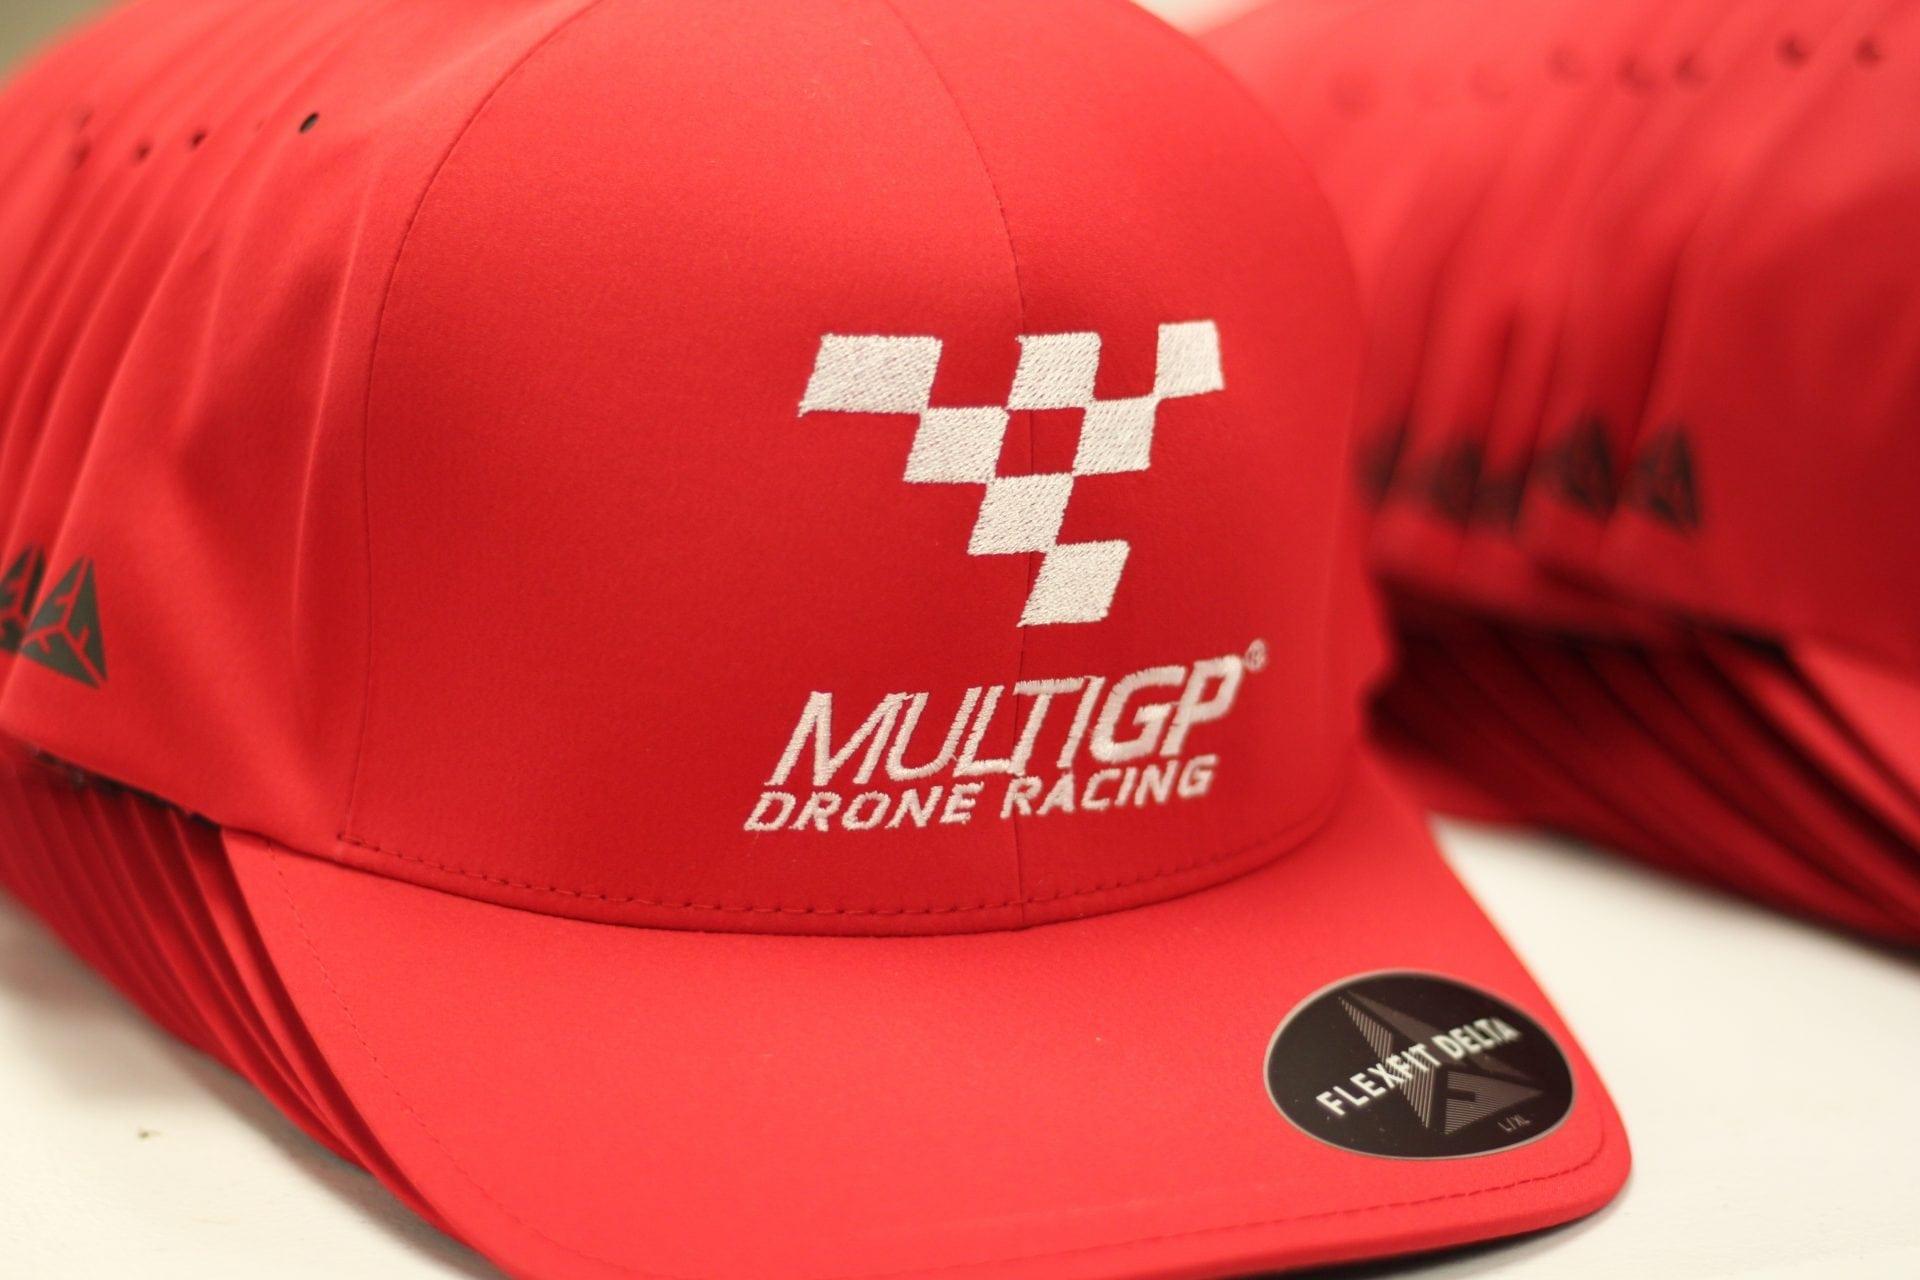 Vertigo Drones OGIO Endurance Hat (Black) |Drone Racing Hat